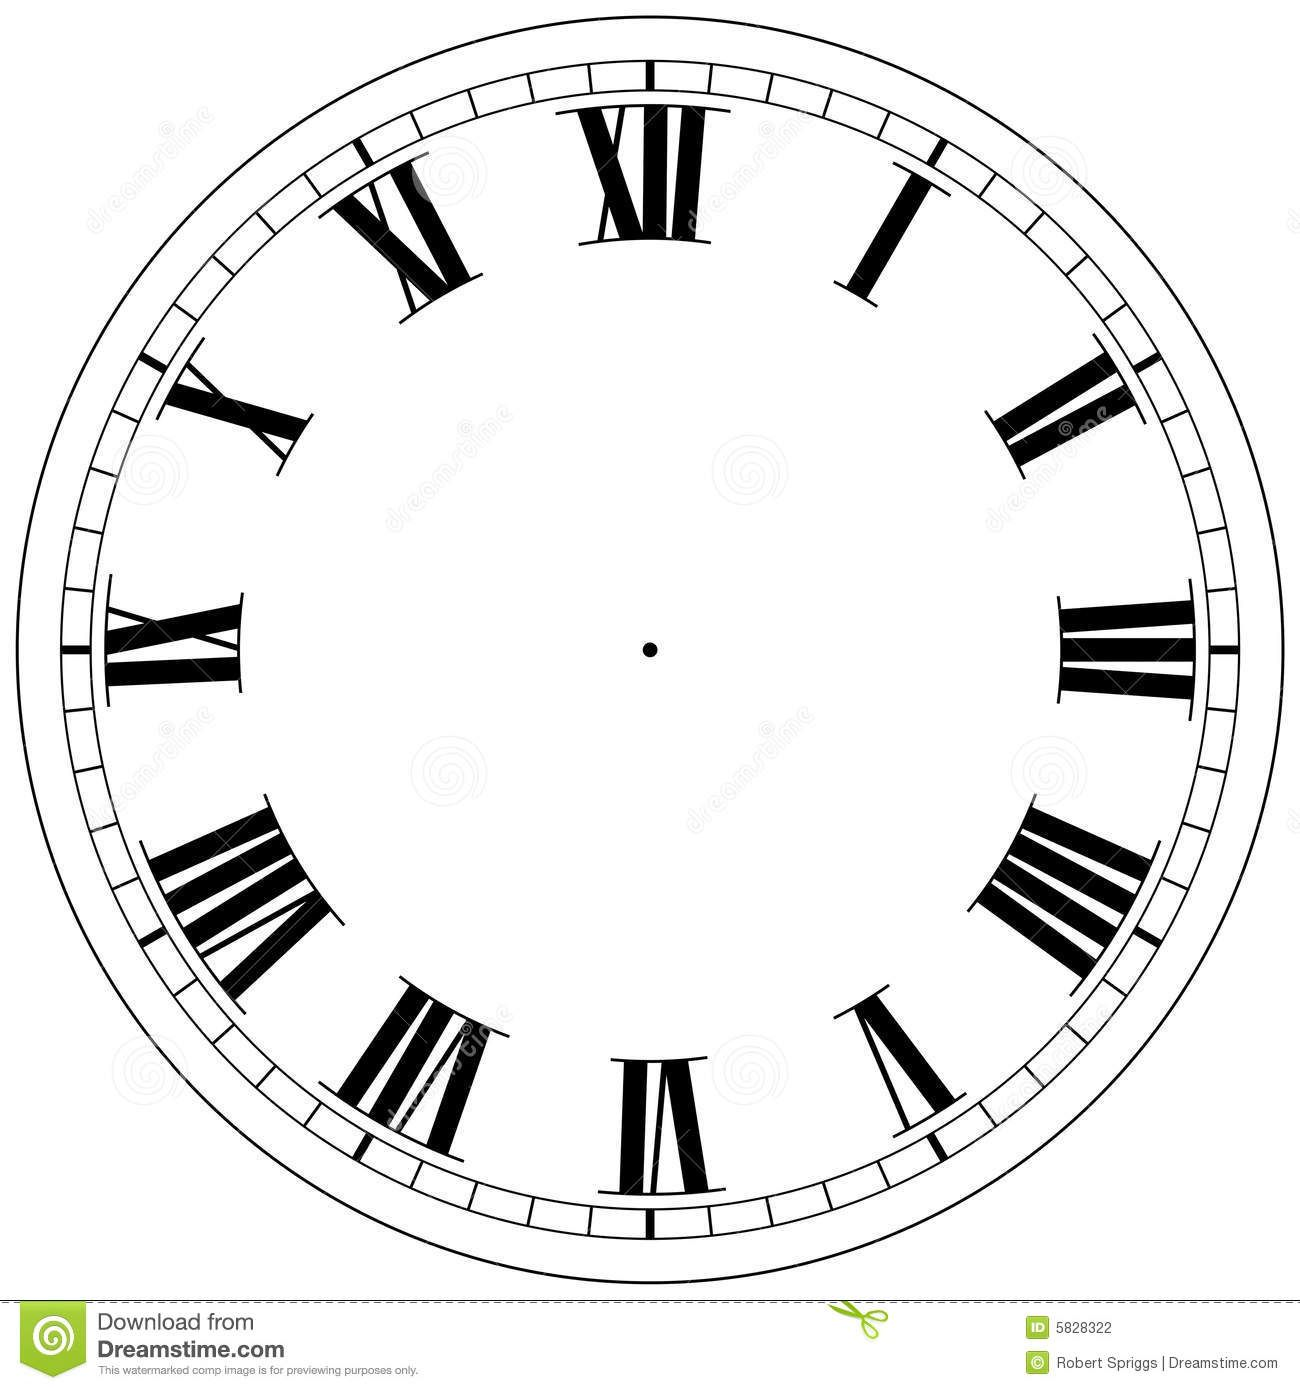 Clock face template googlesuche reloj manualidades roma